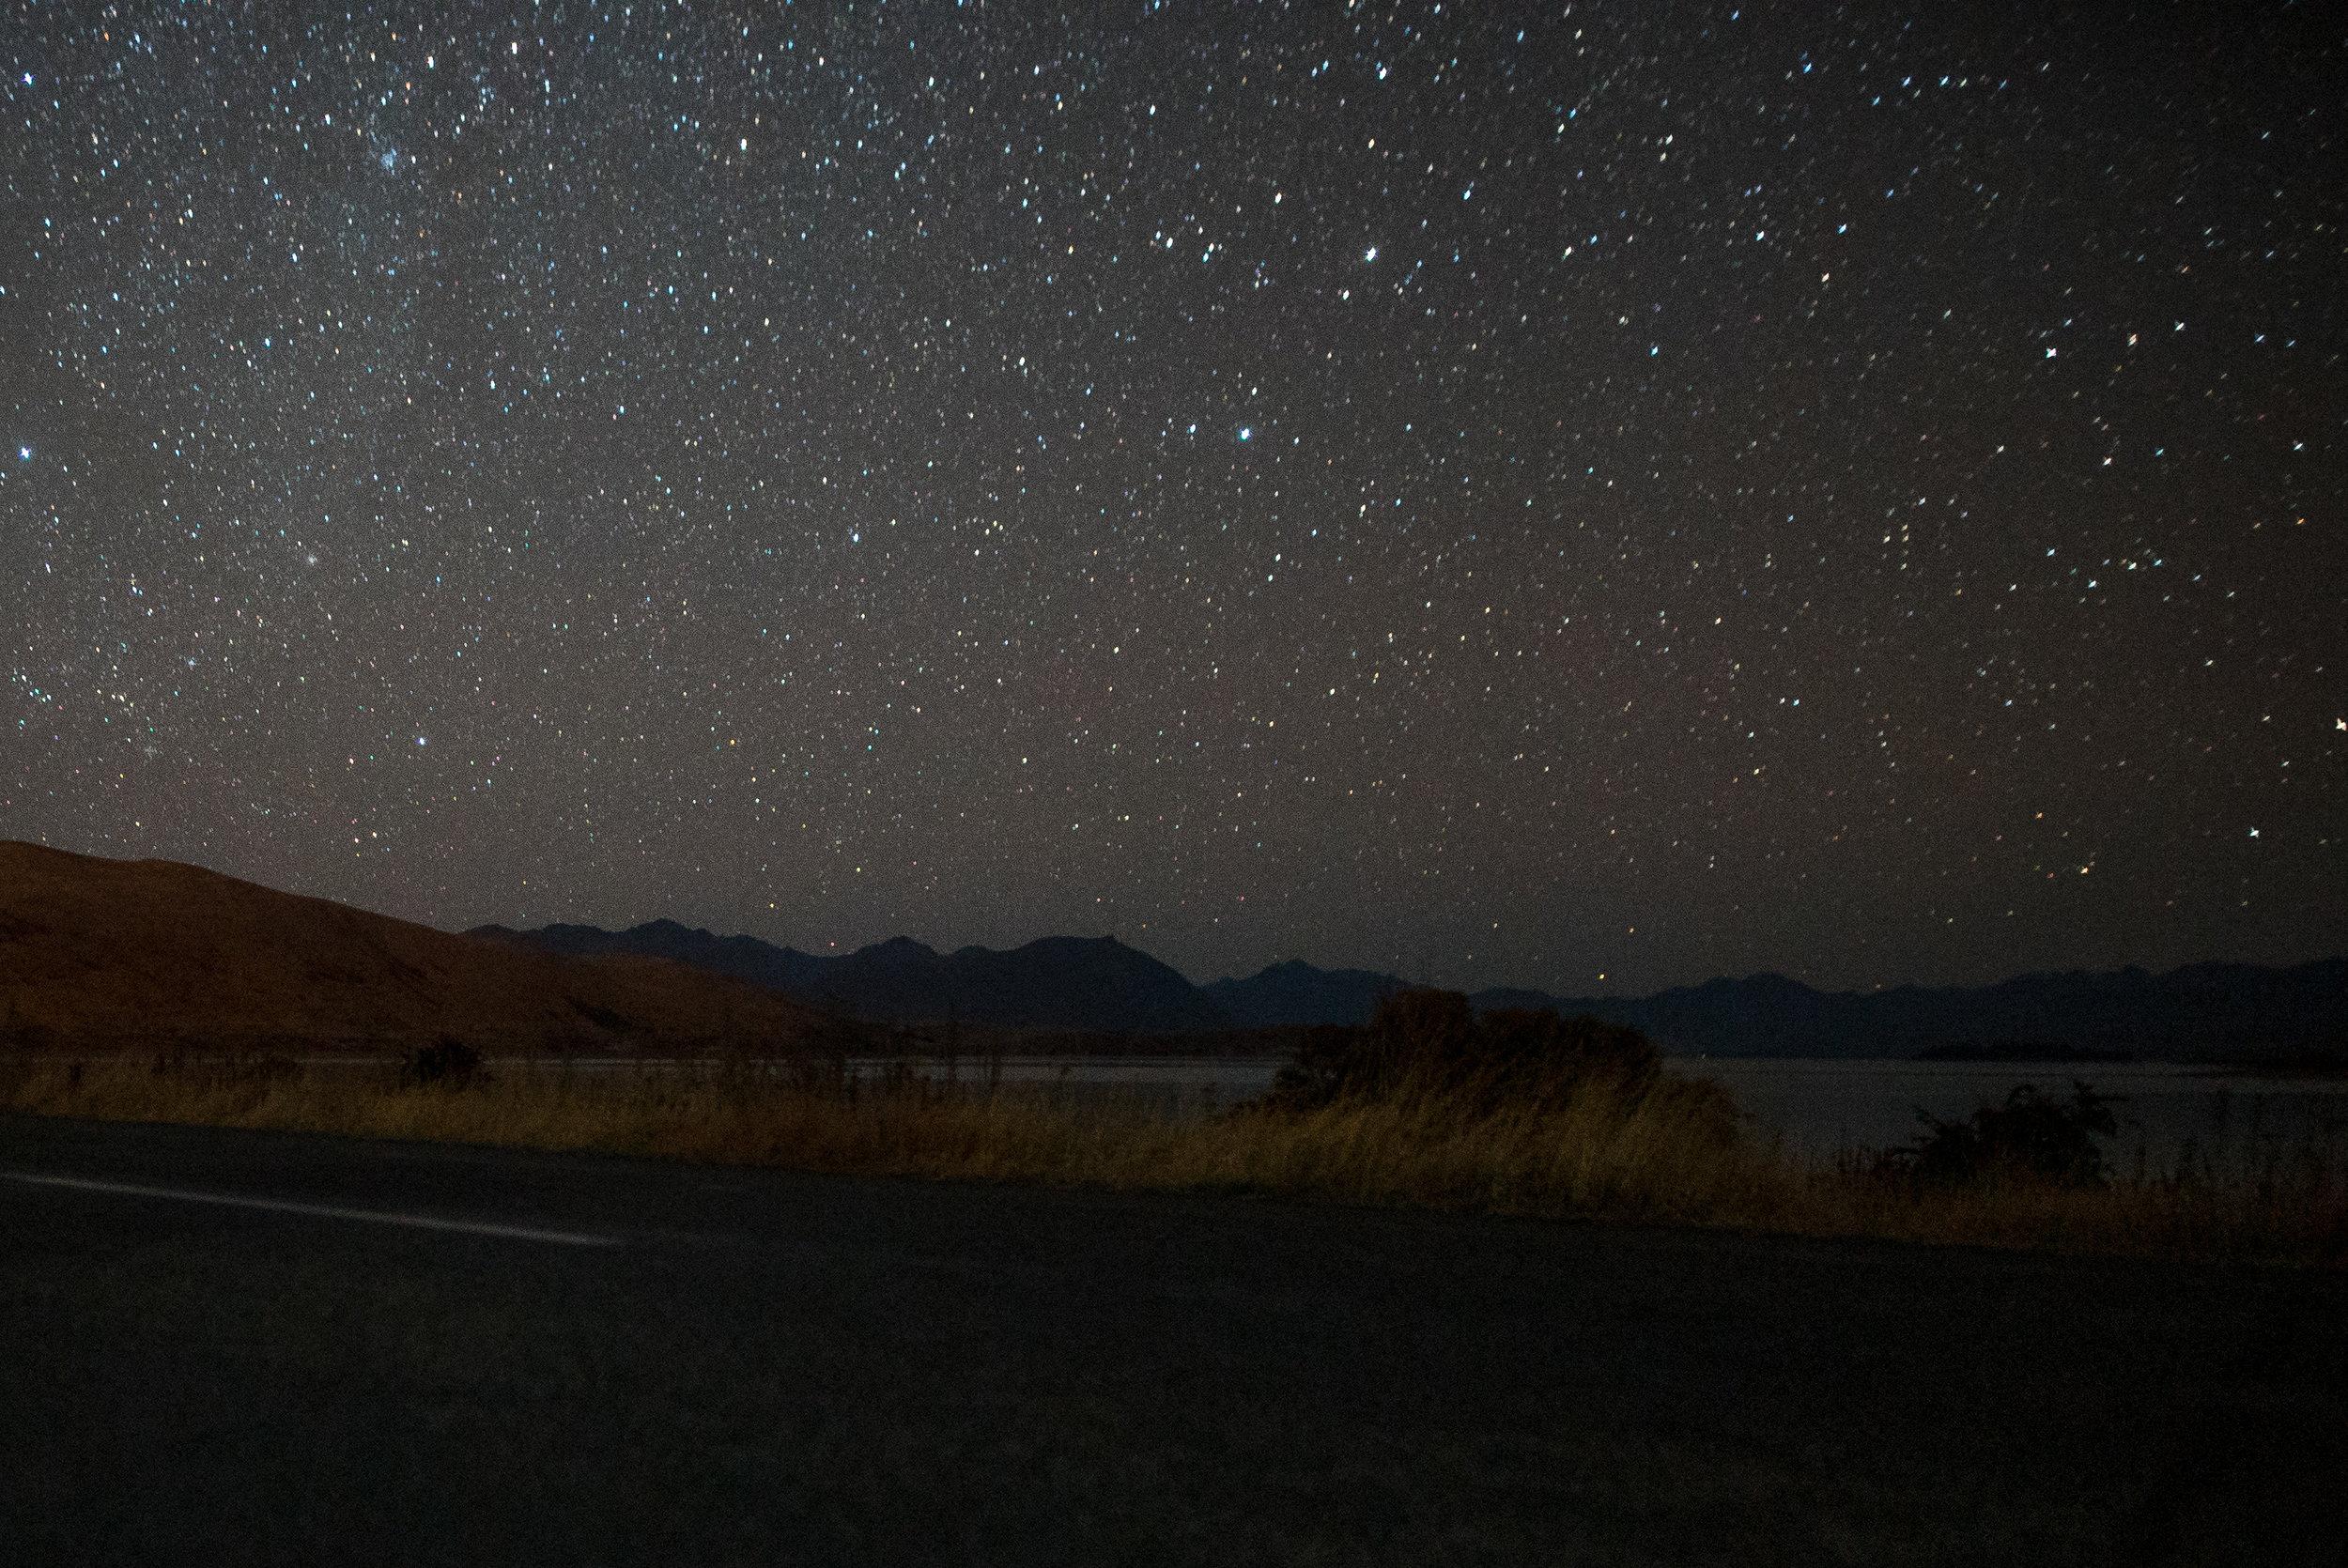 TEKAPO - 2 days under the star filled skies exploring Mt. Cook